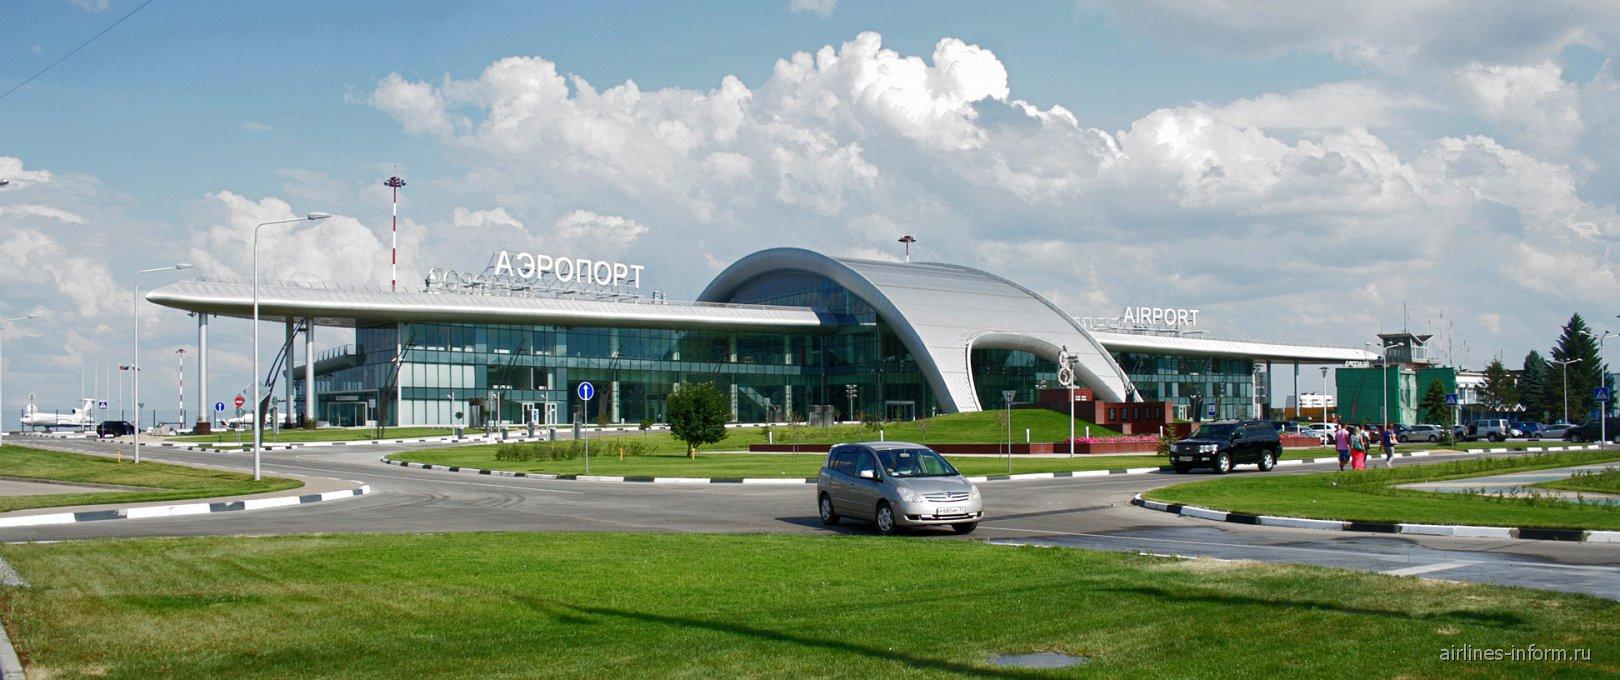 Аэровокзал аэропорта Белгород